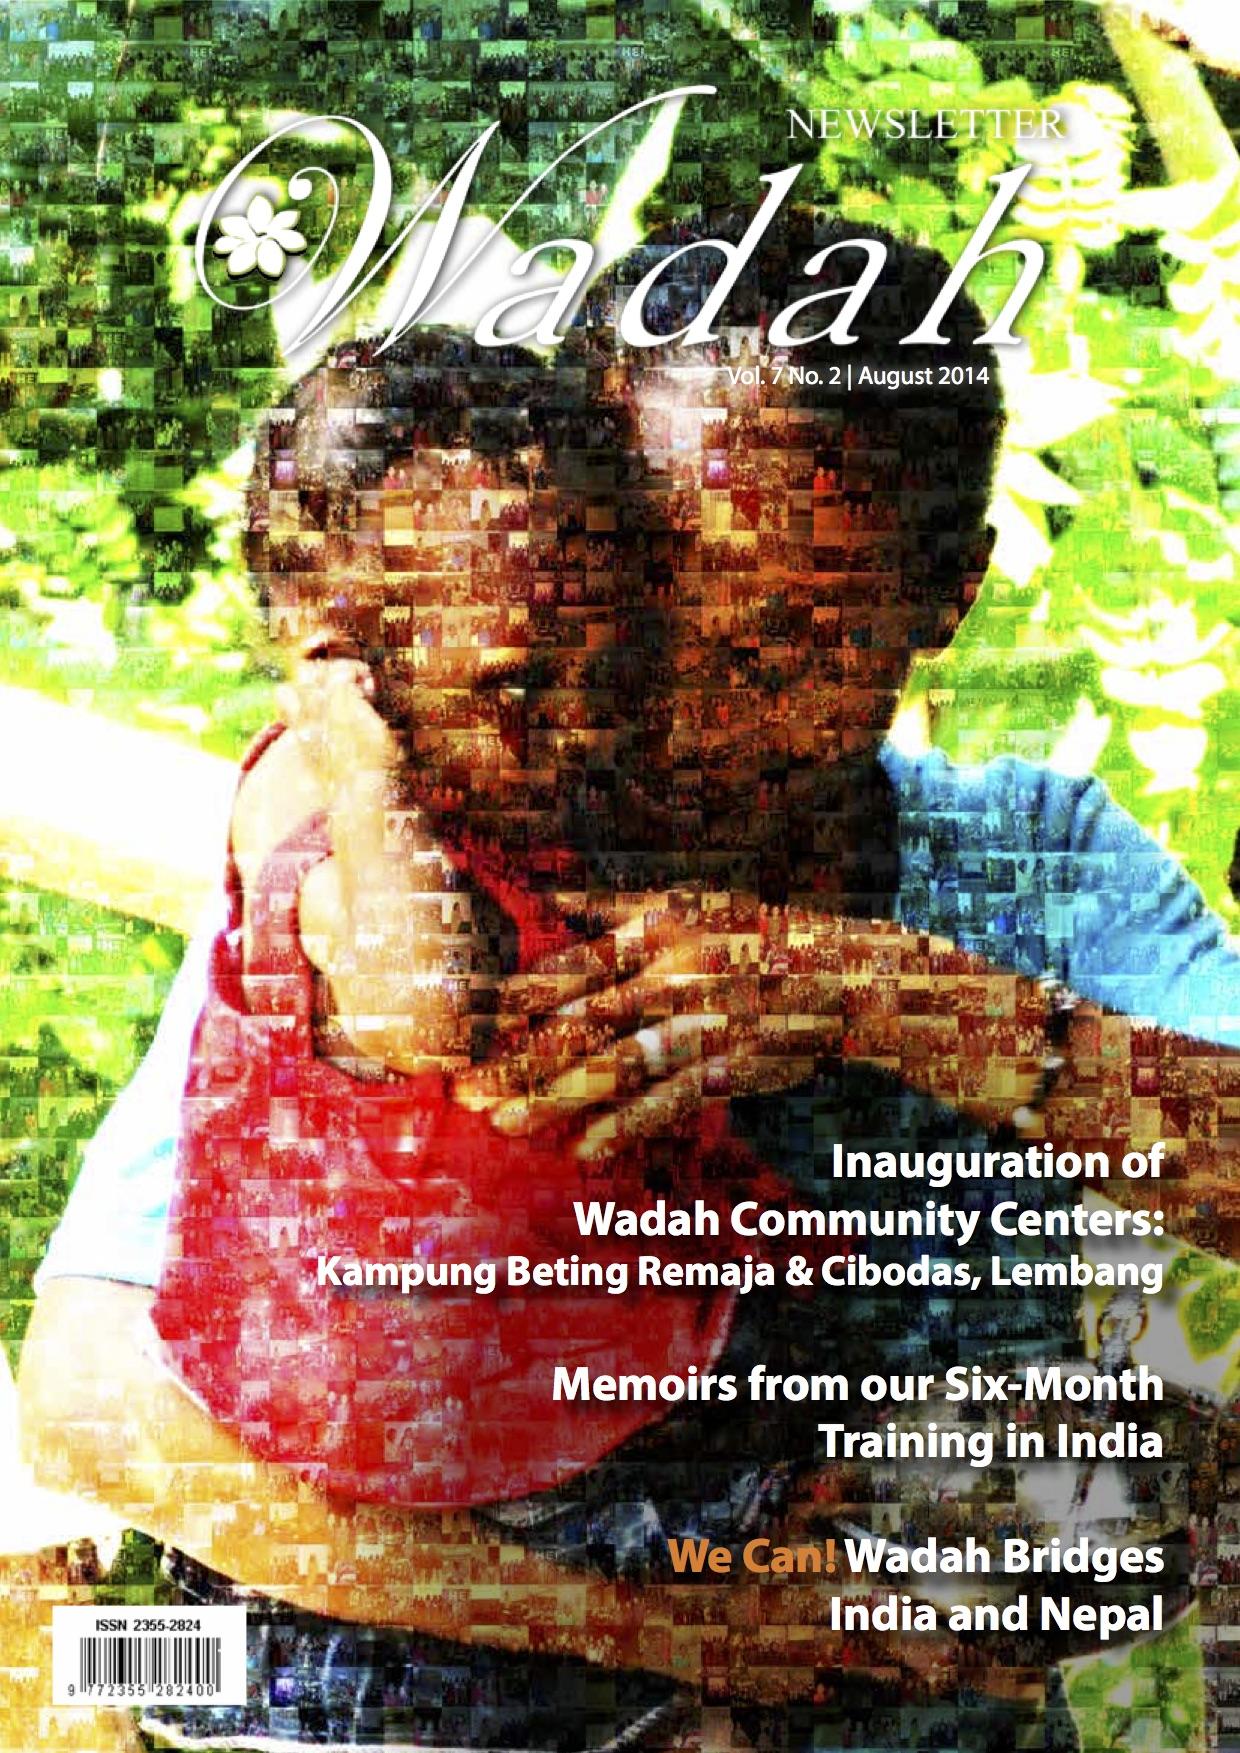 Vol. 7 No. 2 - August 2014